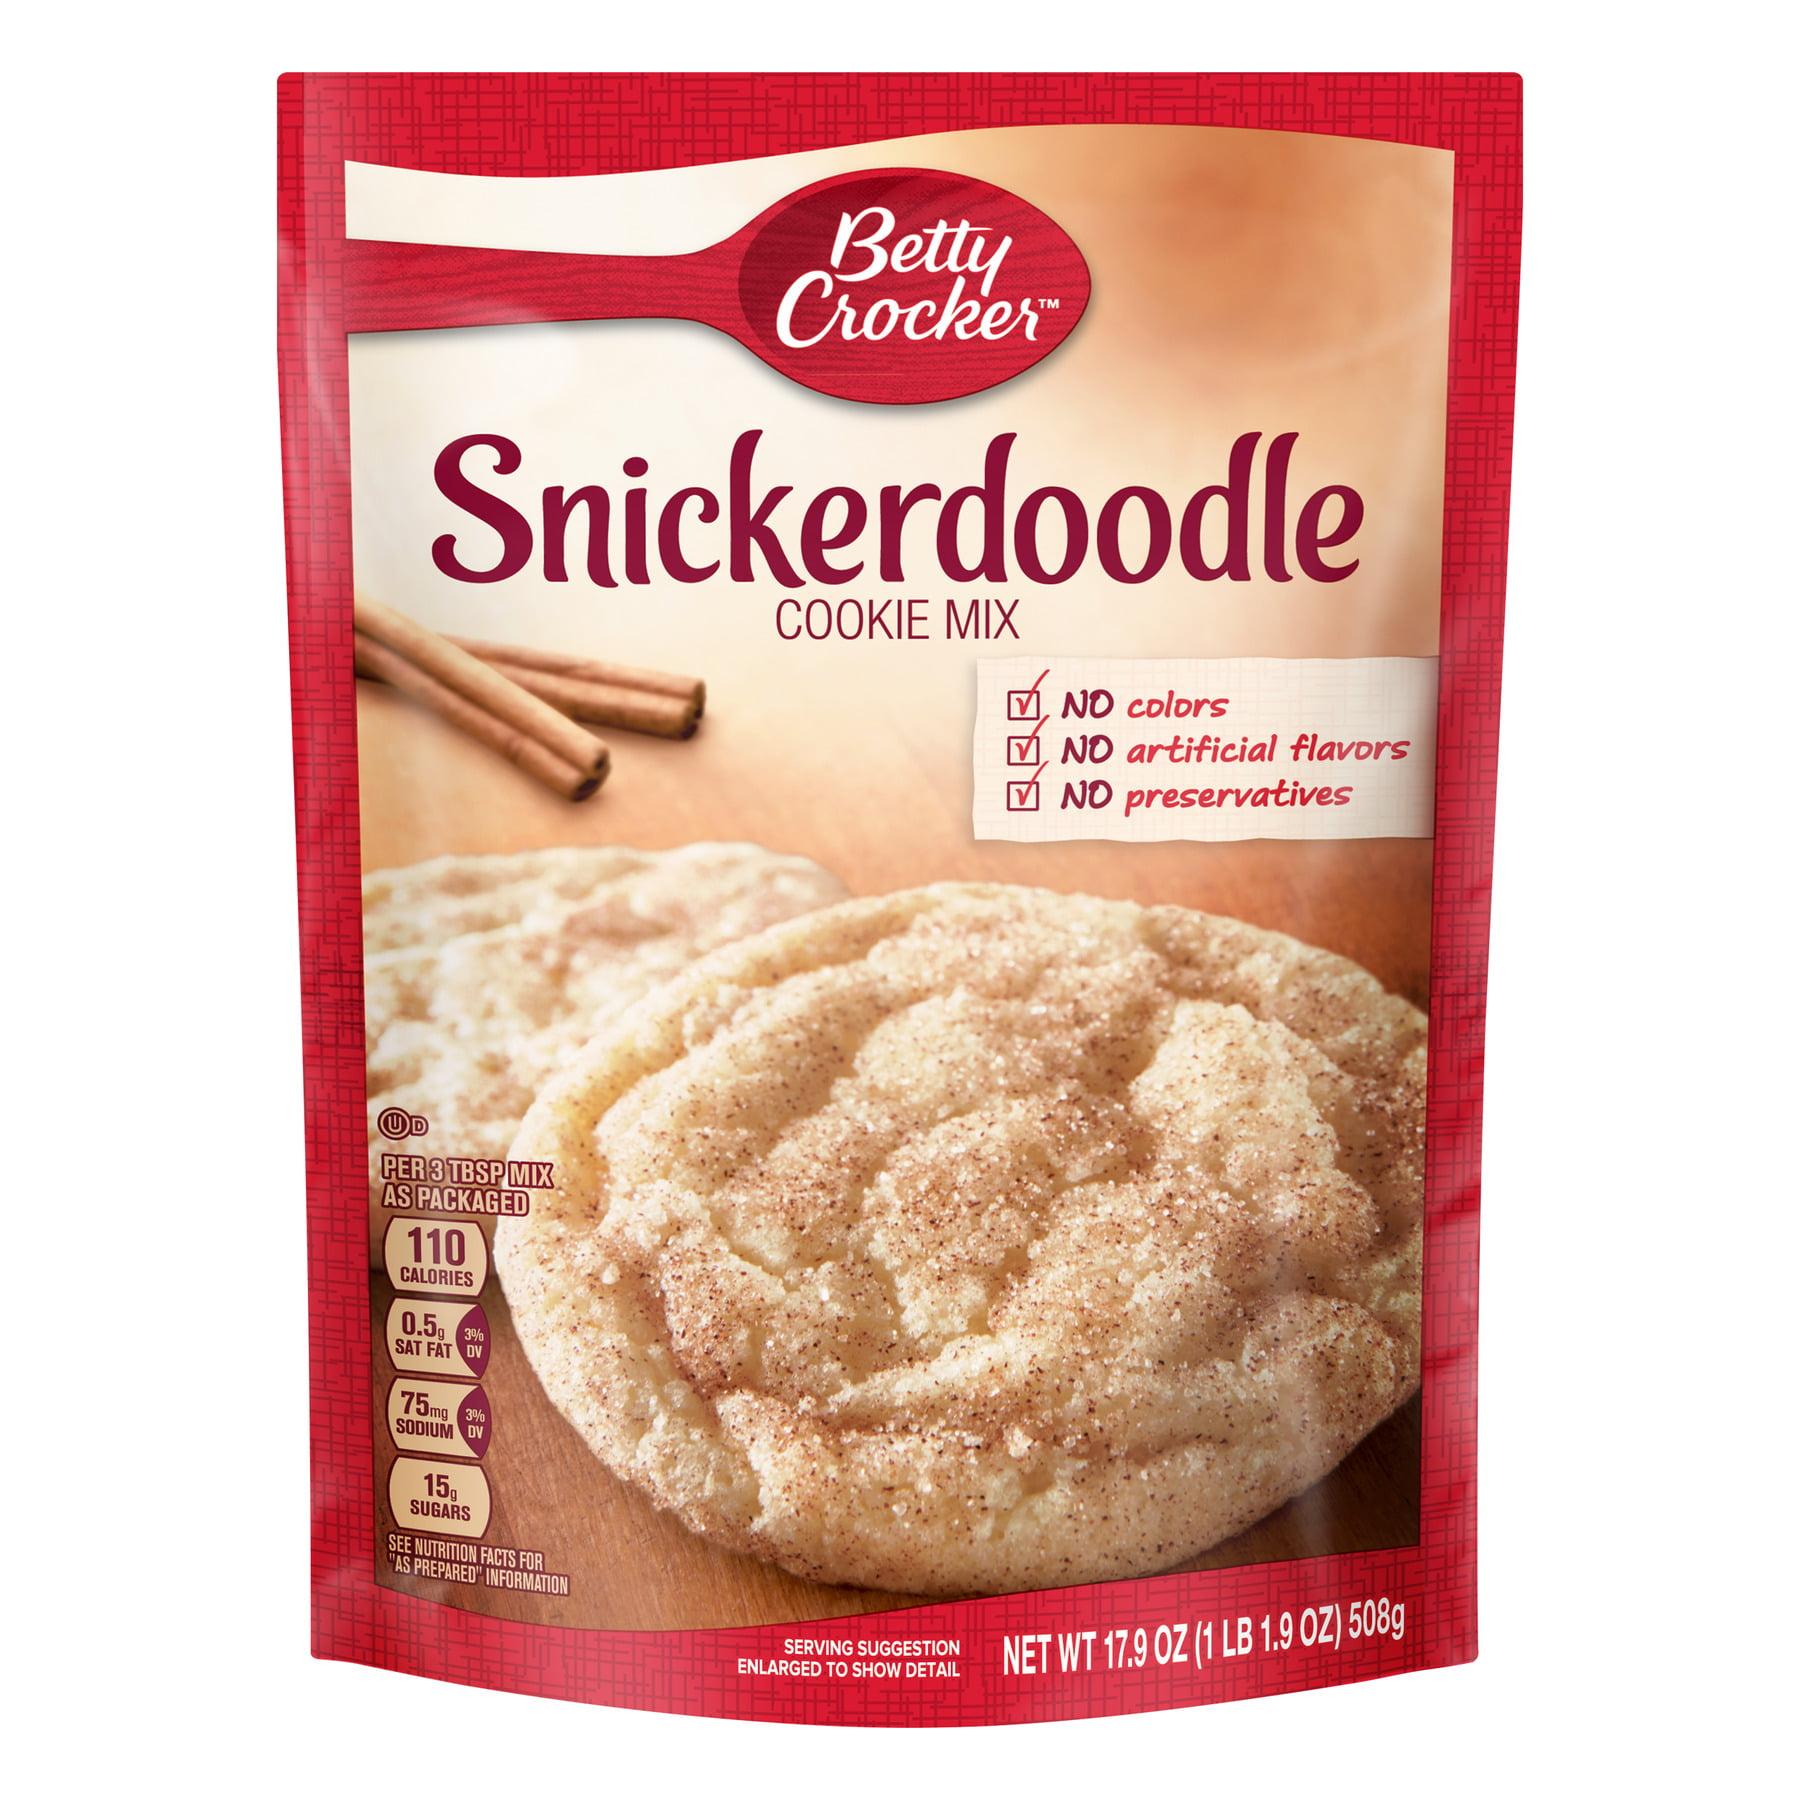 Betty Crocker Snickerdoodle Cookie Mix, 17.9 oz Box